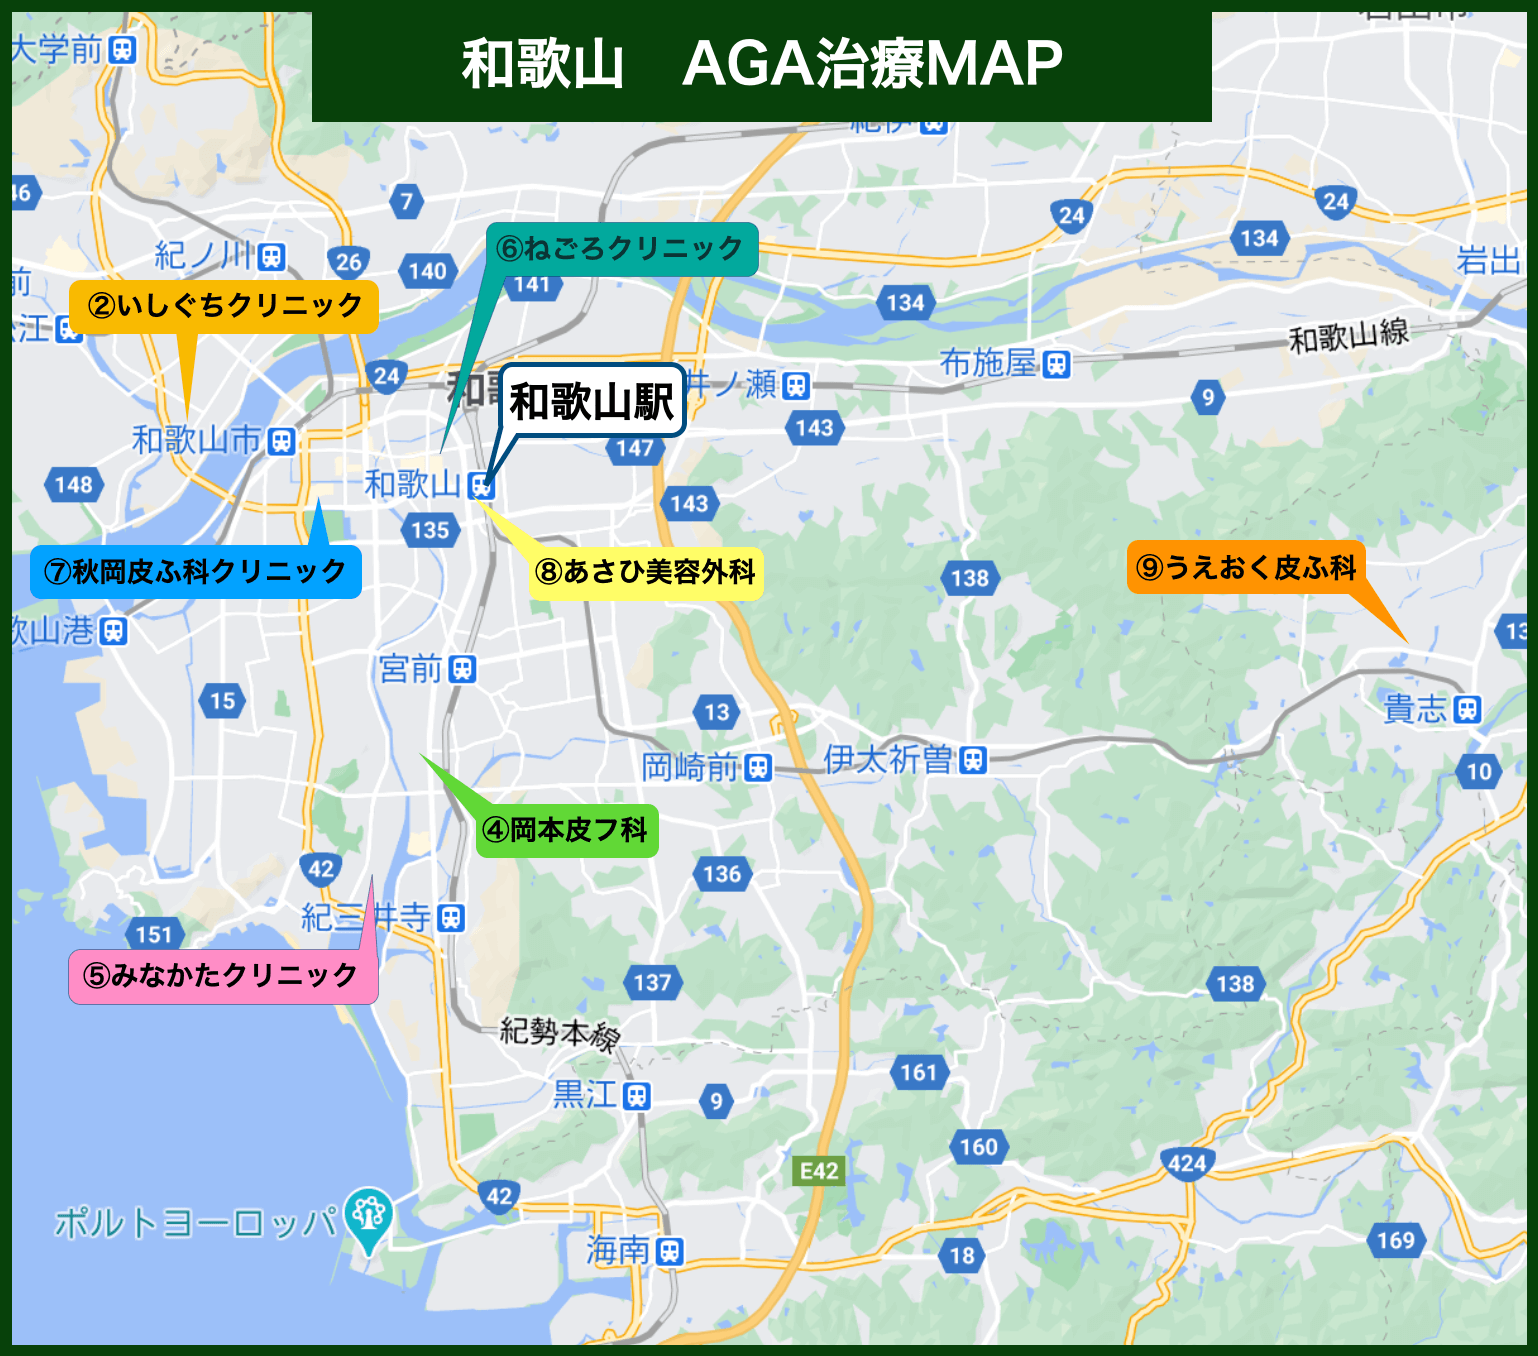 和歌山AGA治療MAP